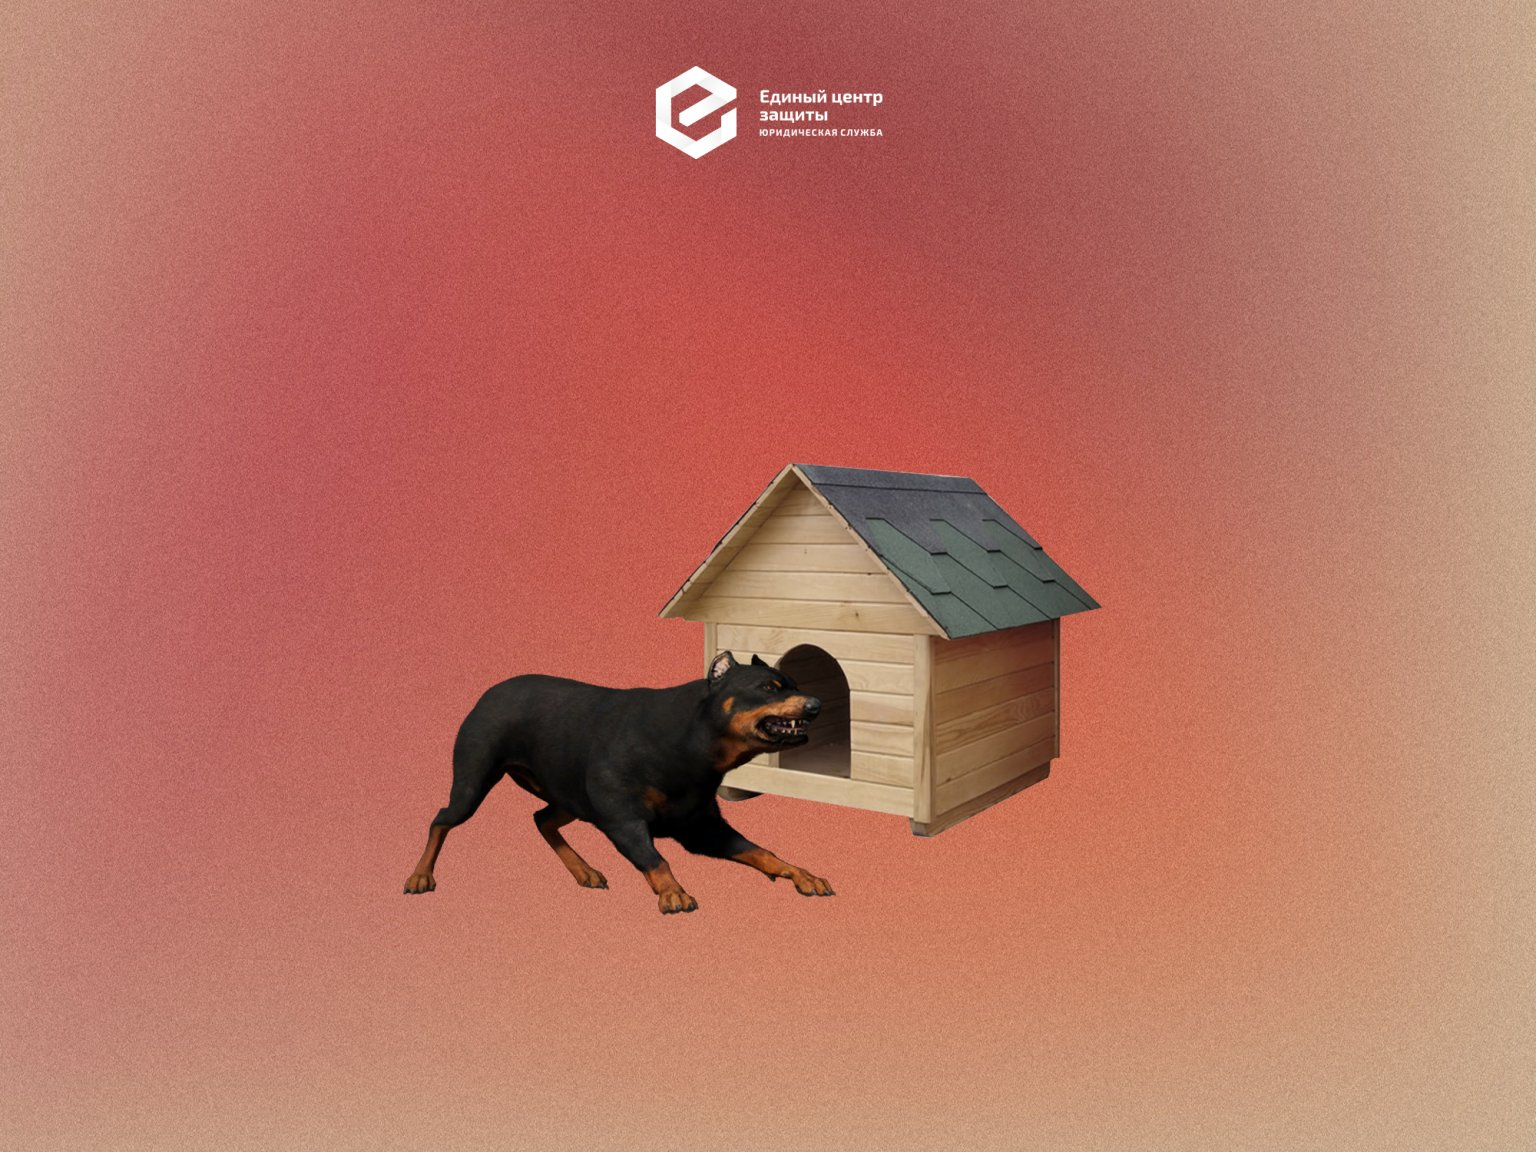 Собака лает, караван не спит: дело о компенсации за громких соседских собак (практика ЕЦЗ)